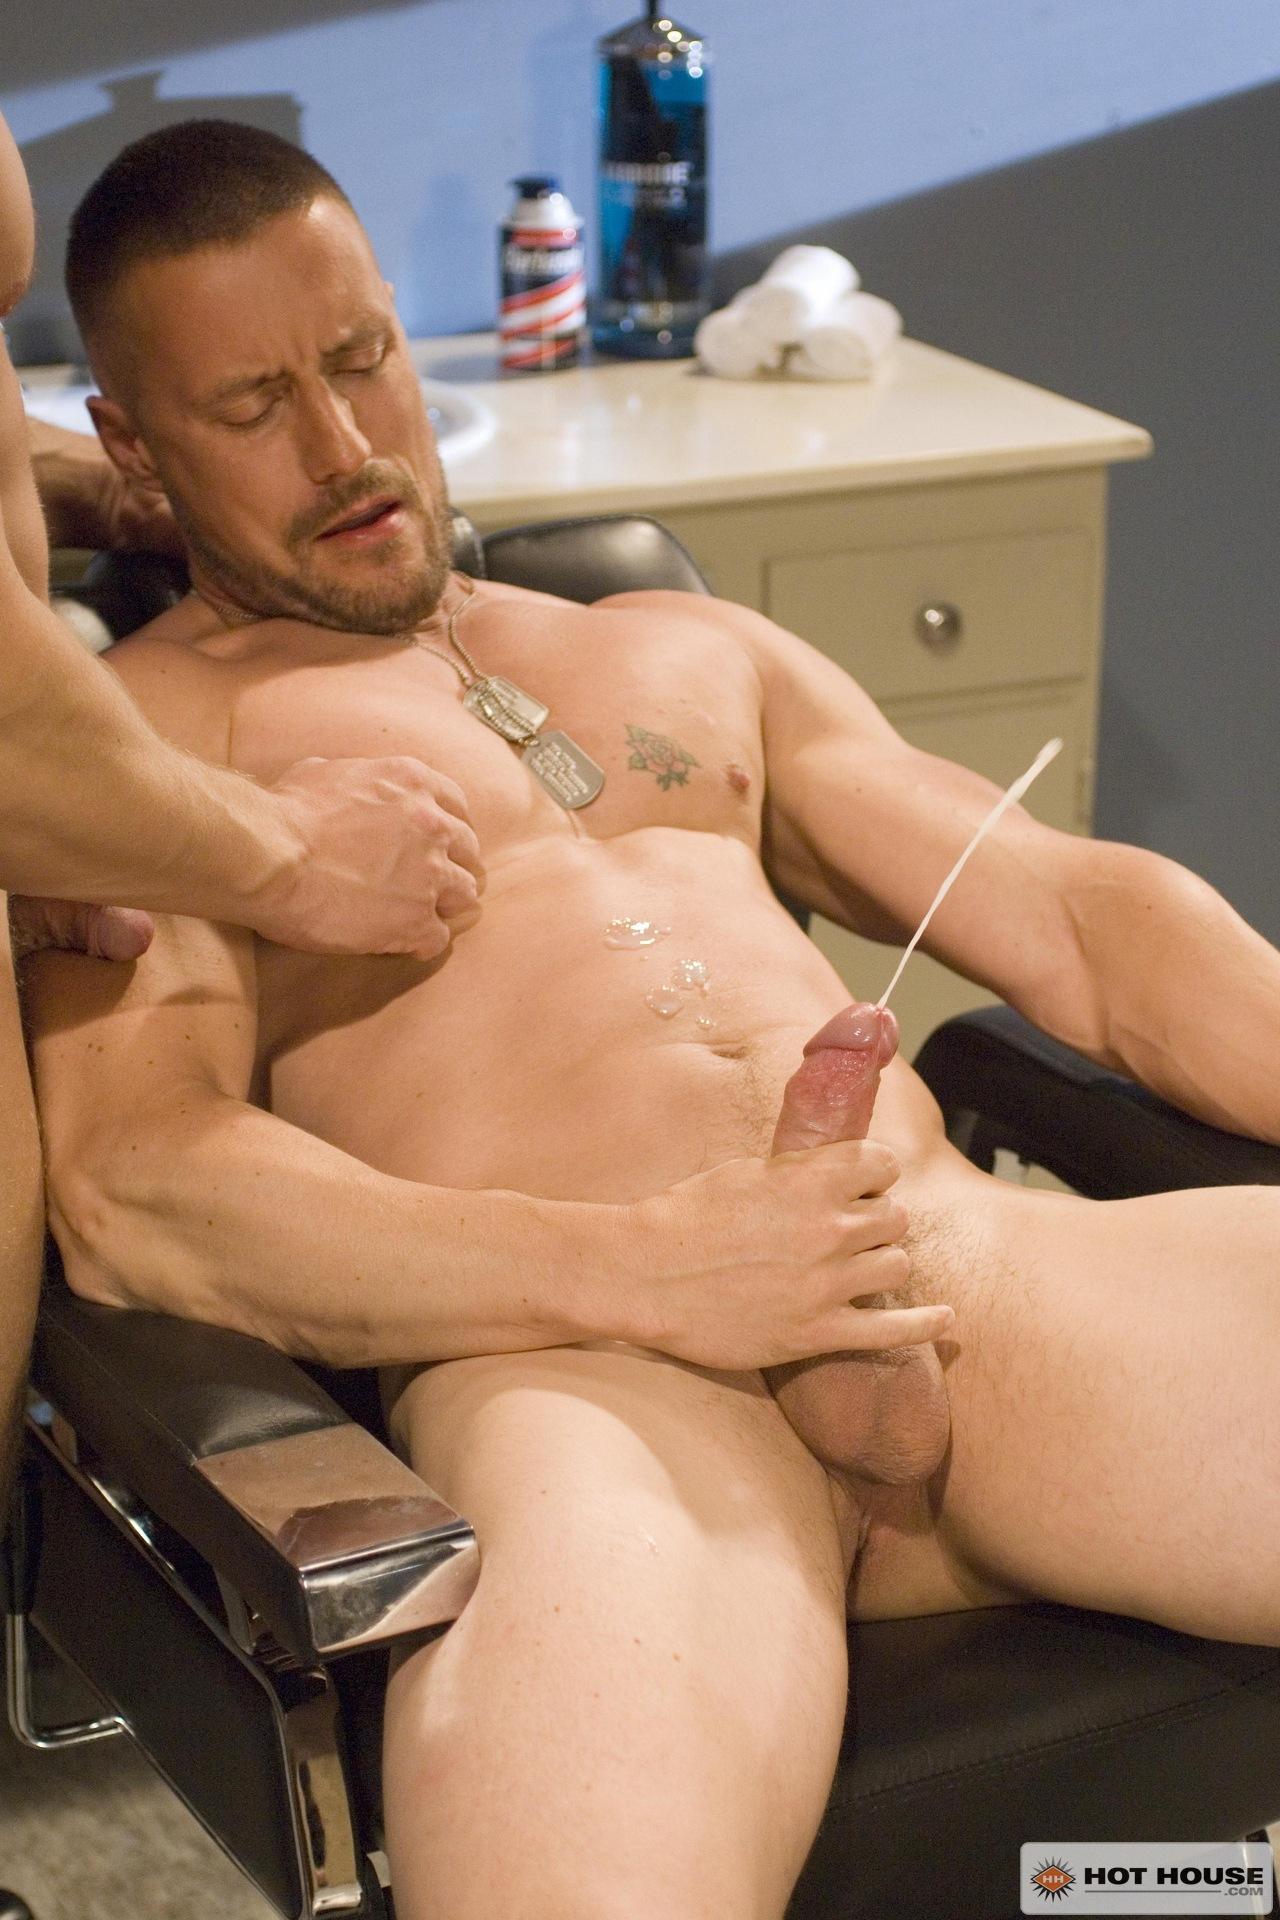 Nude men cumshots clips gay well leon got 2